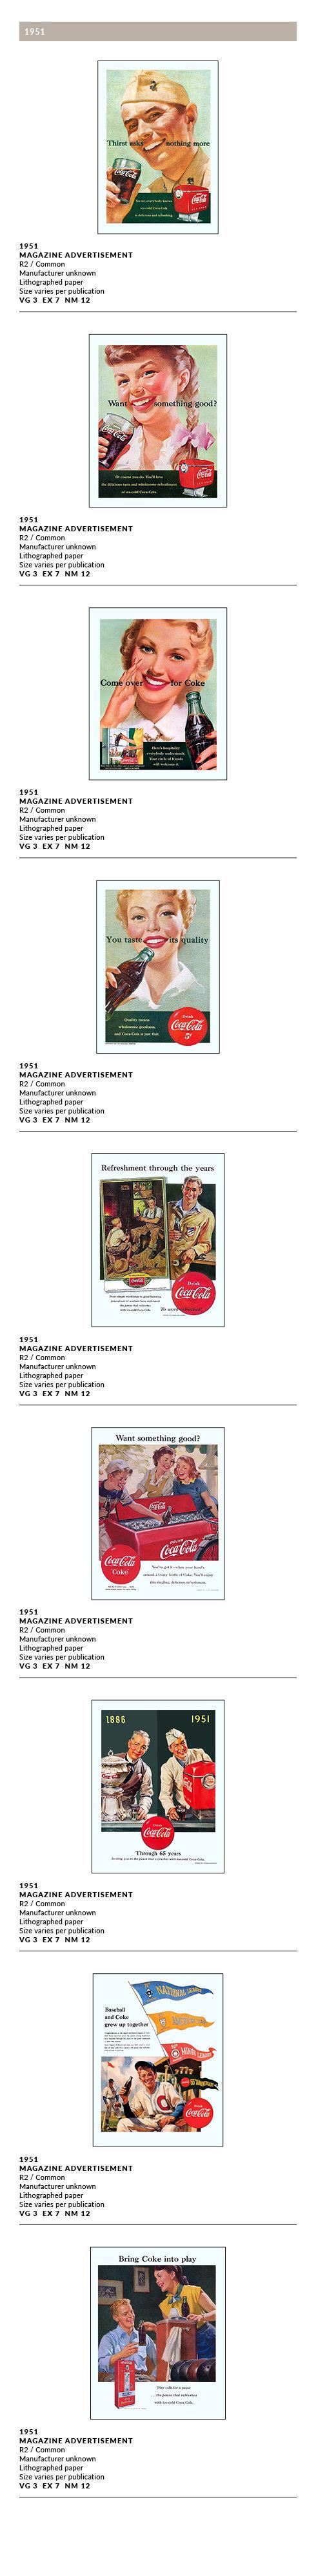 1950-54 Ads3.jpg